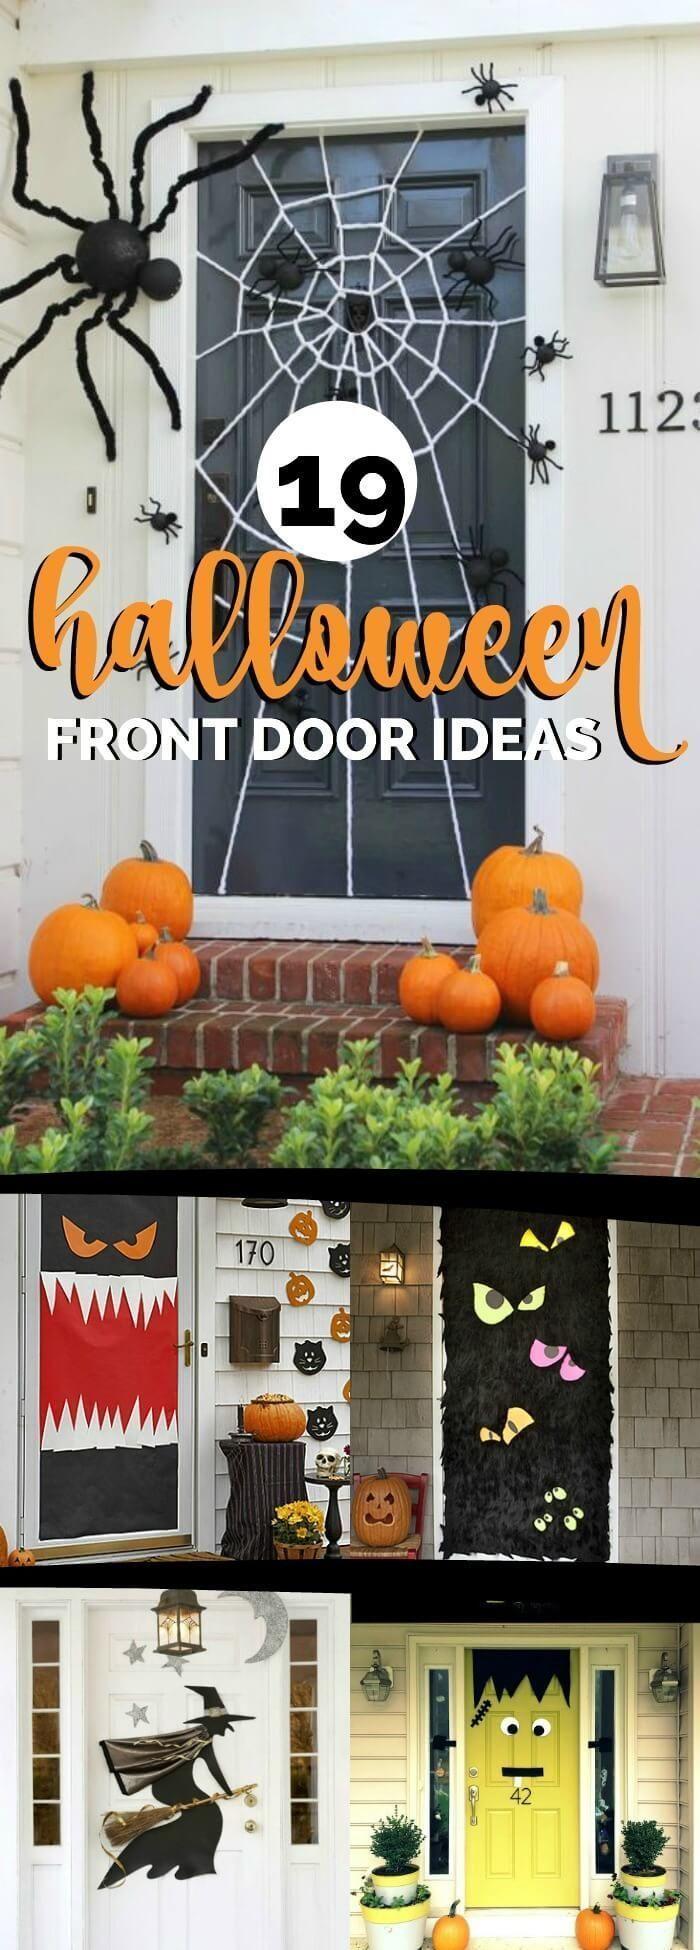 Vintage Halloween Decorations, Halloween Decorations Ideas